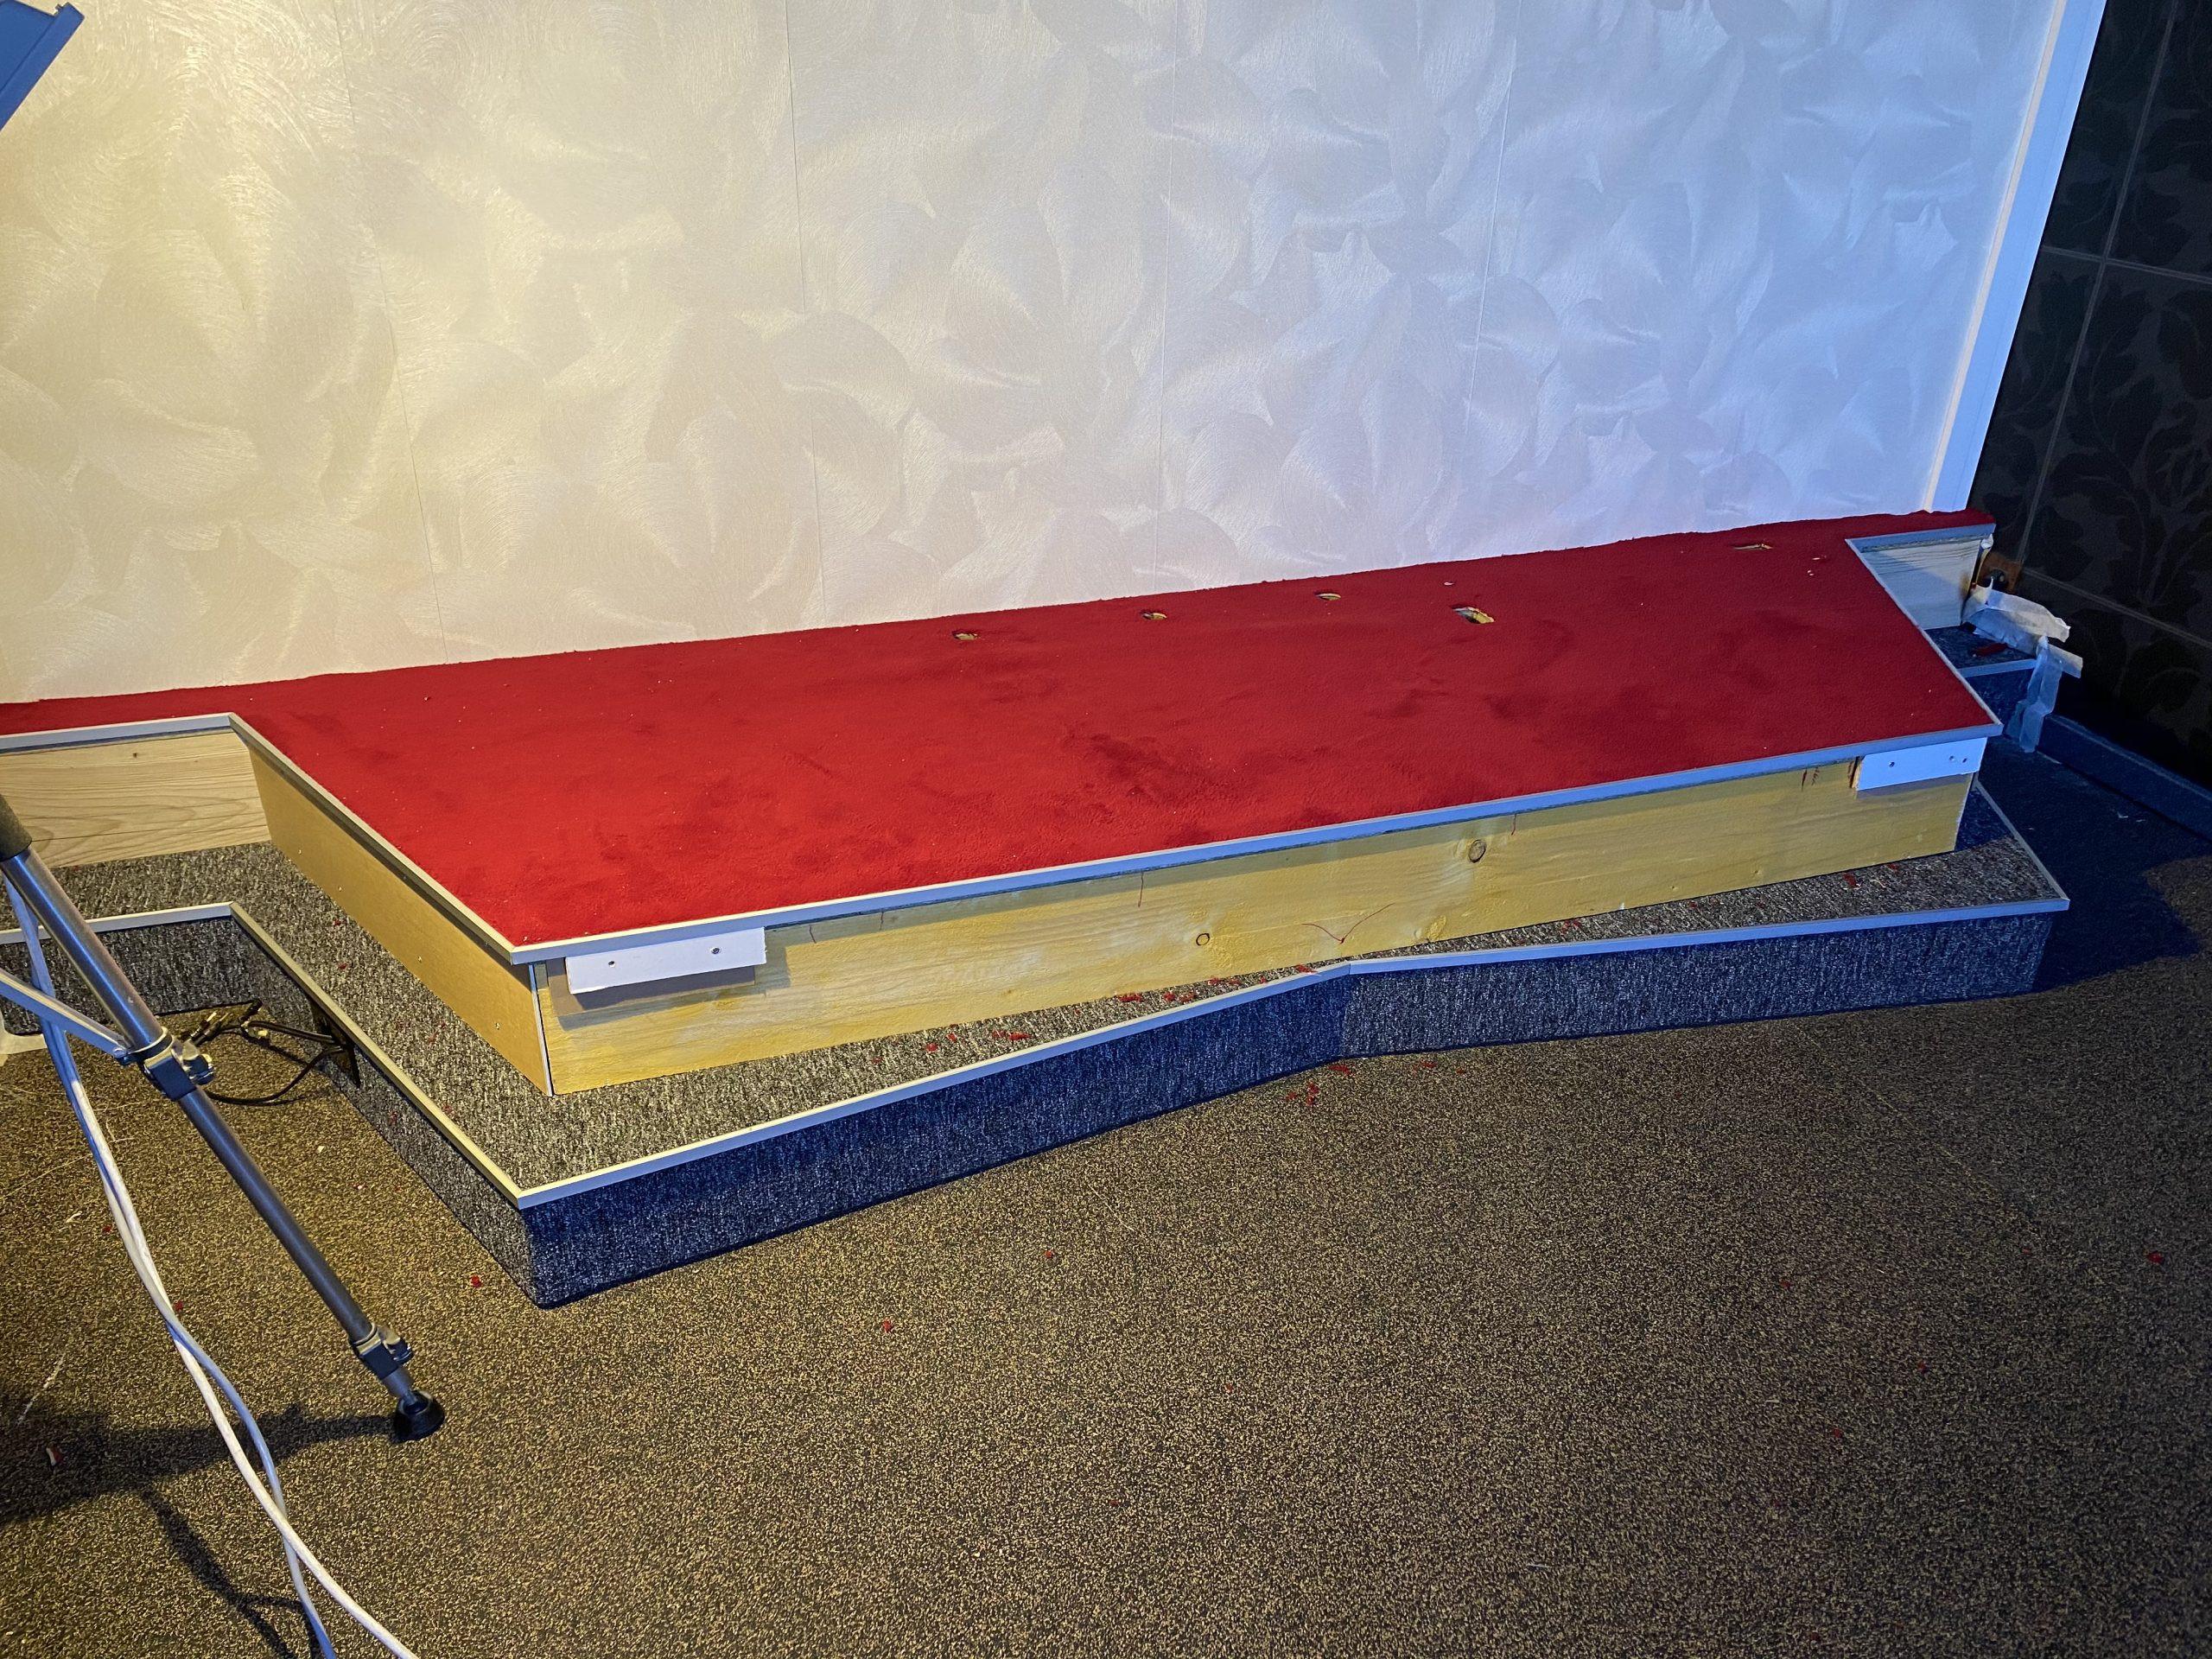 蜂蜜浏览器_Construction-du-podium-avant-4-scaled.jpg